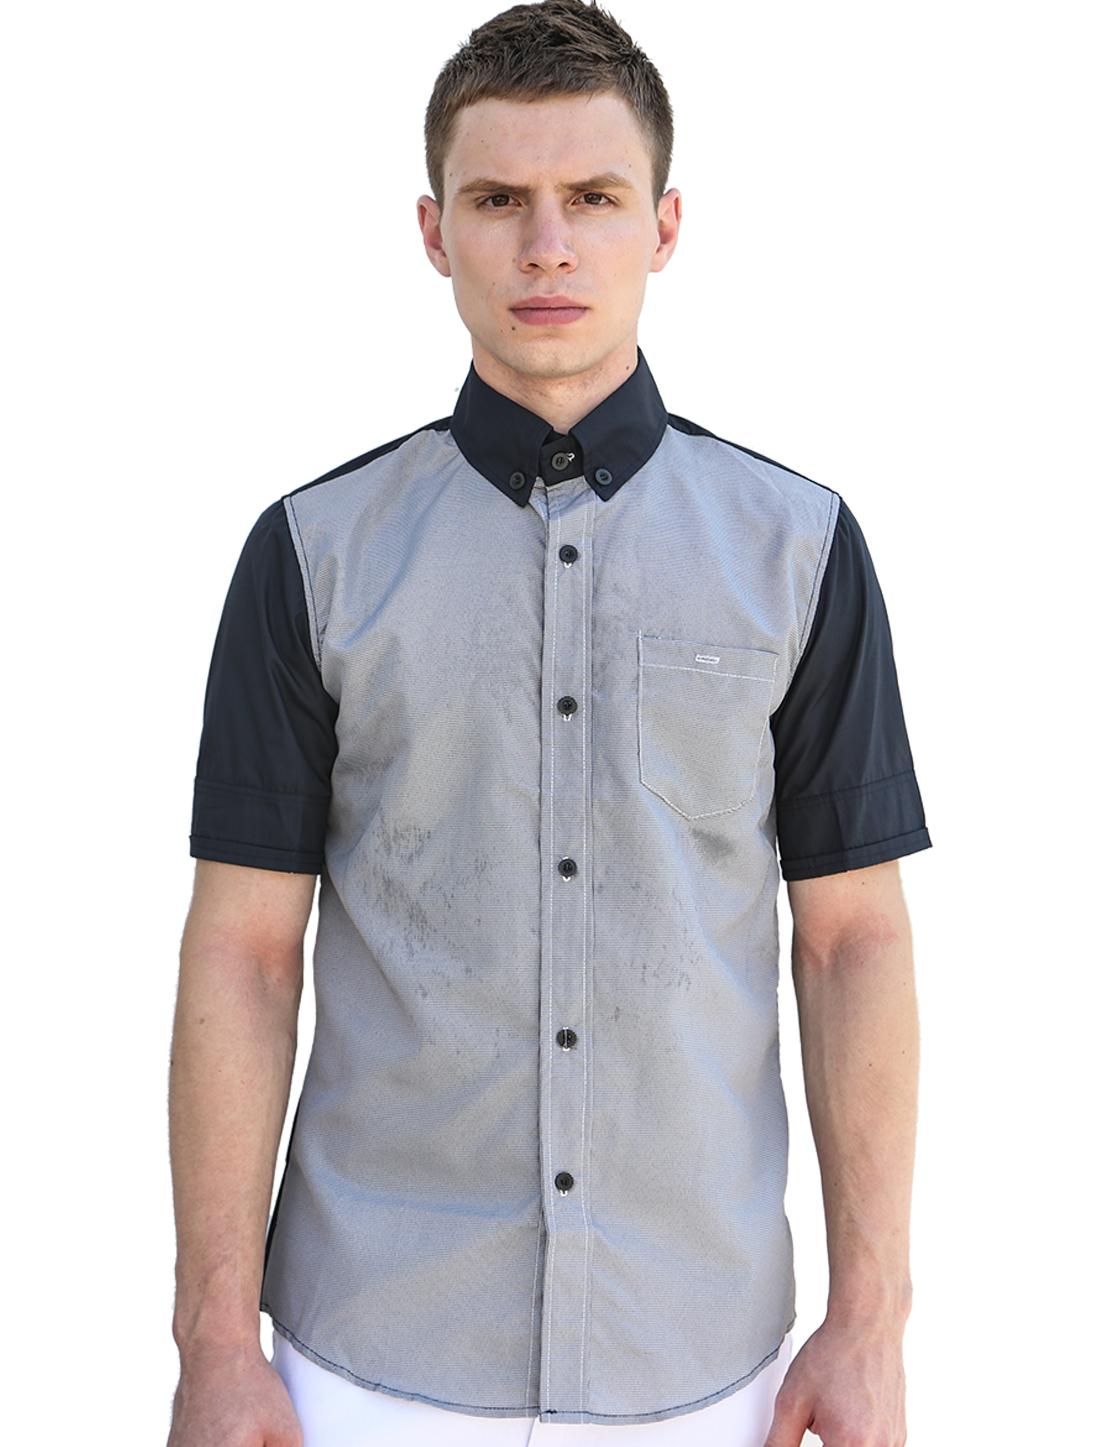 Men Short Sleeves Houndstooth Print Button Down Shirts Navy Blue M